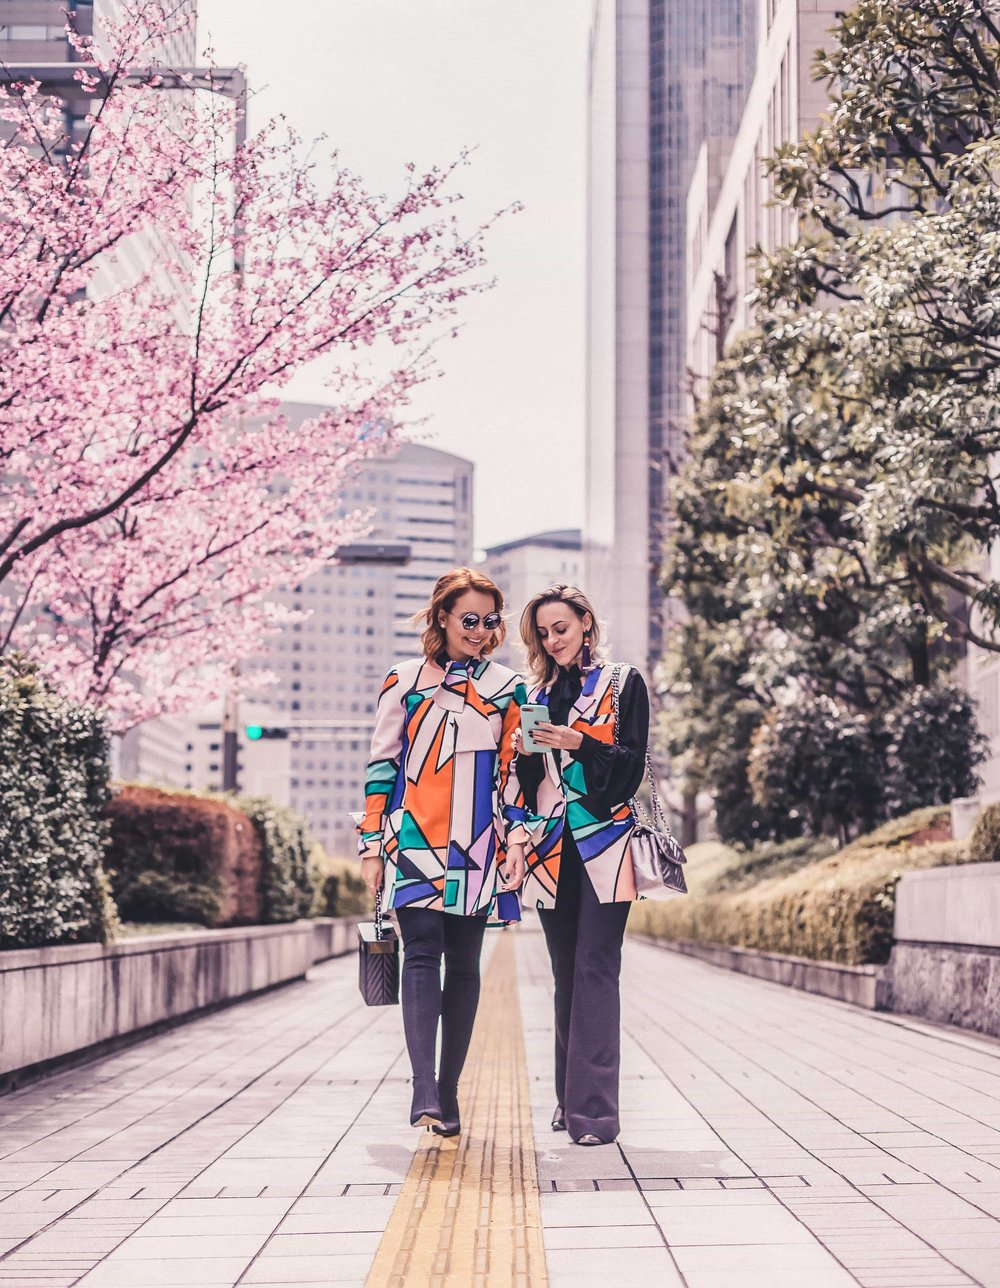 Tokyo photographer hire freelance travel casual candid Japan (13).jpg